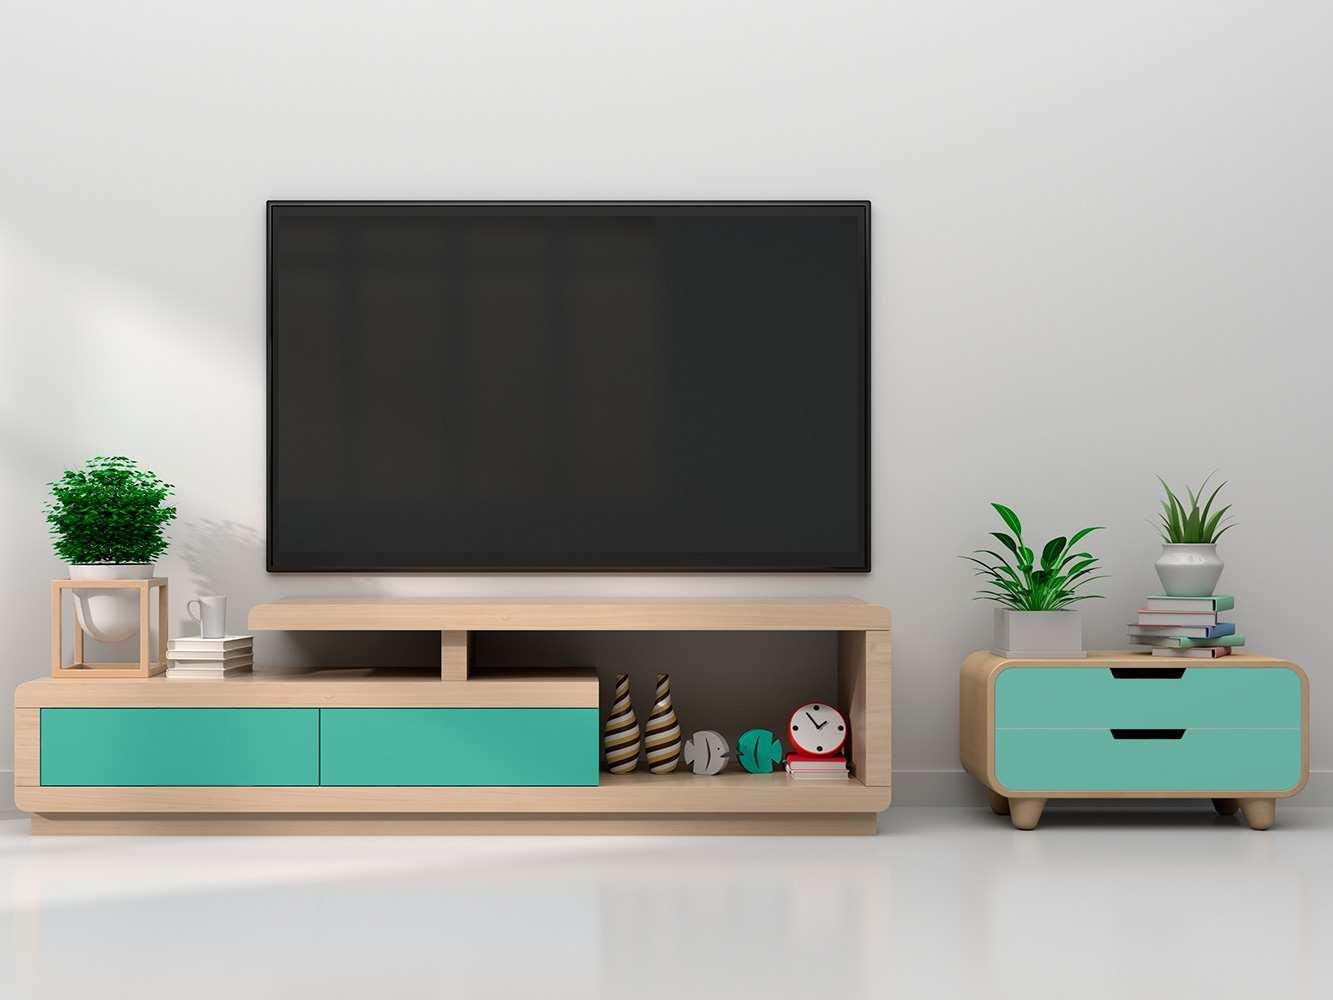 Vinilo Decorativo Mueble Azul Tiffany | Carteles XXL - Impresión carteleria publicitaria